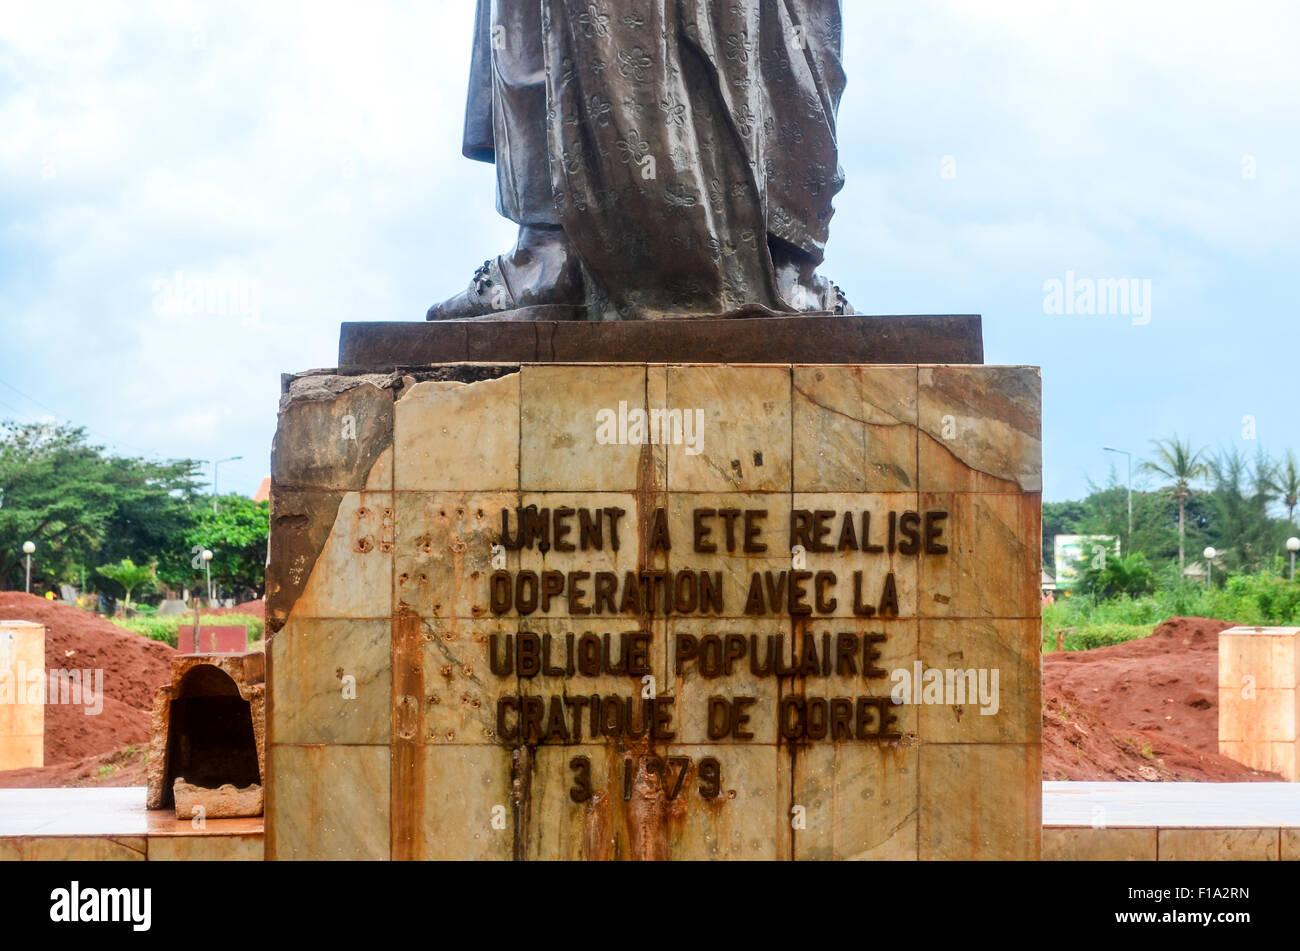 Statue von Nordkorea in Abomey, Benin, Afrika Stockbild